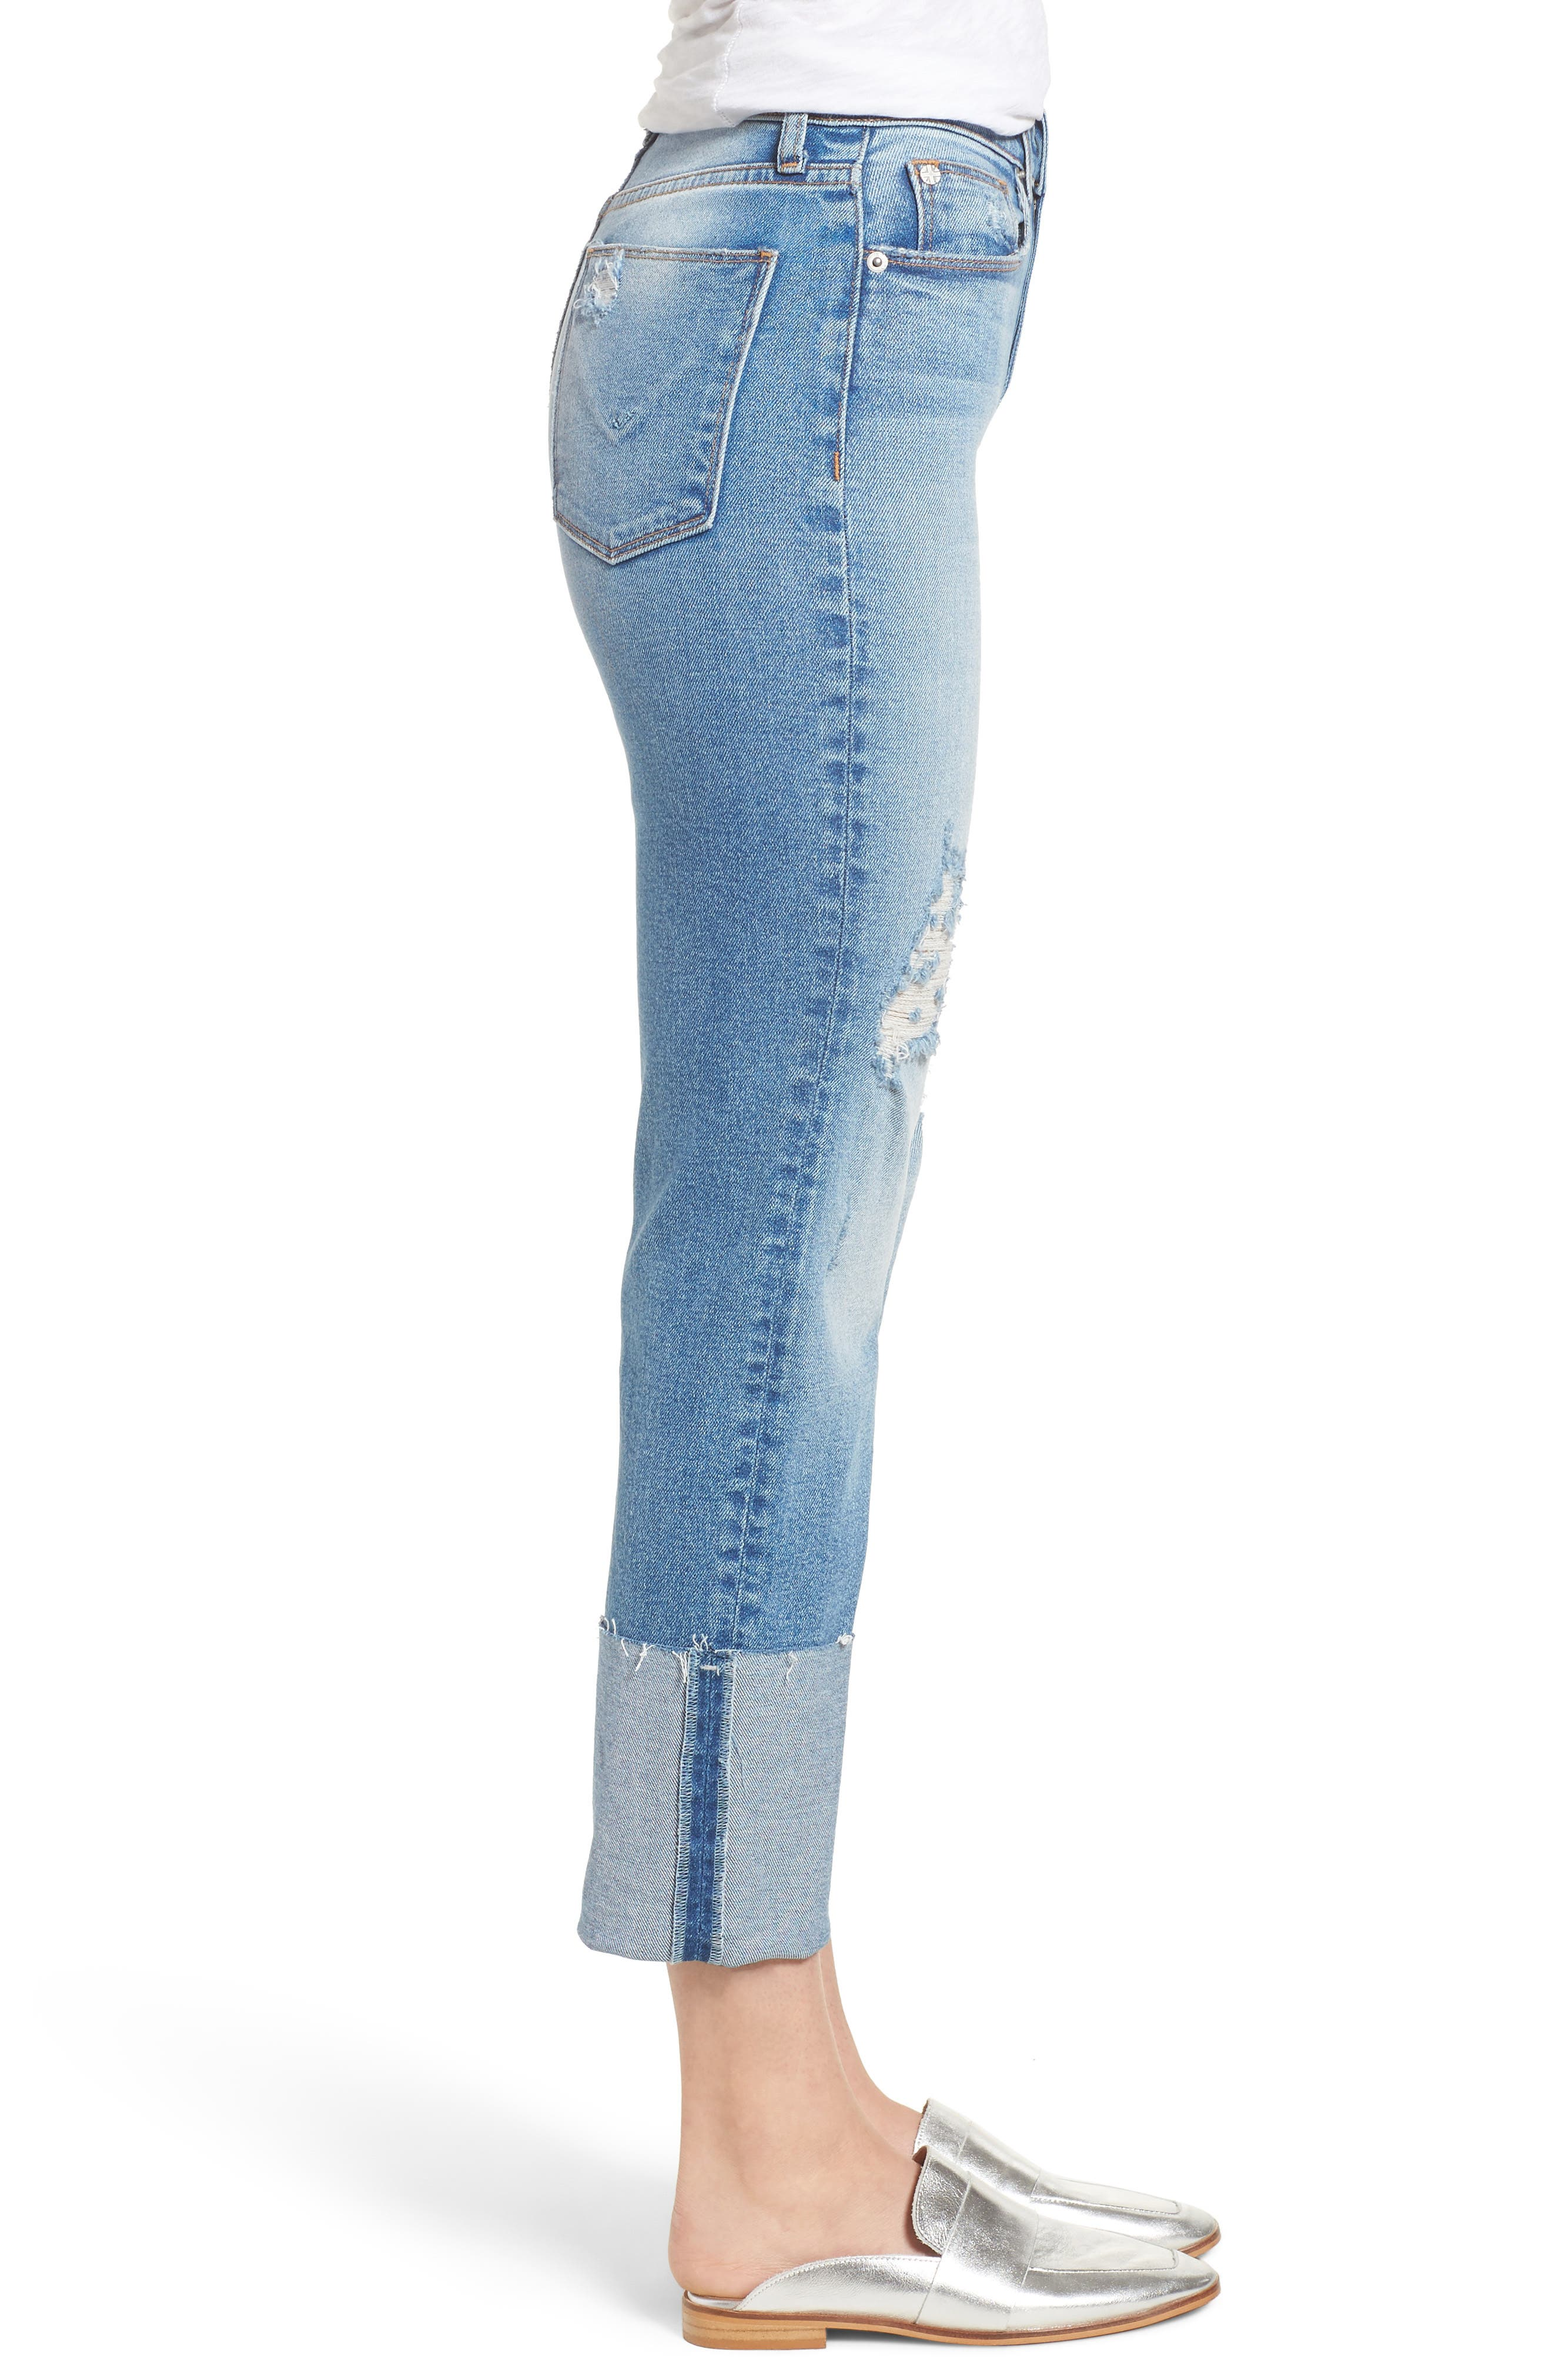 Zoeey High Waist Cuff Straight Leg Jeans,                             Alternate thumbnail 3, color,                             425